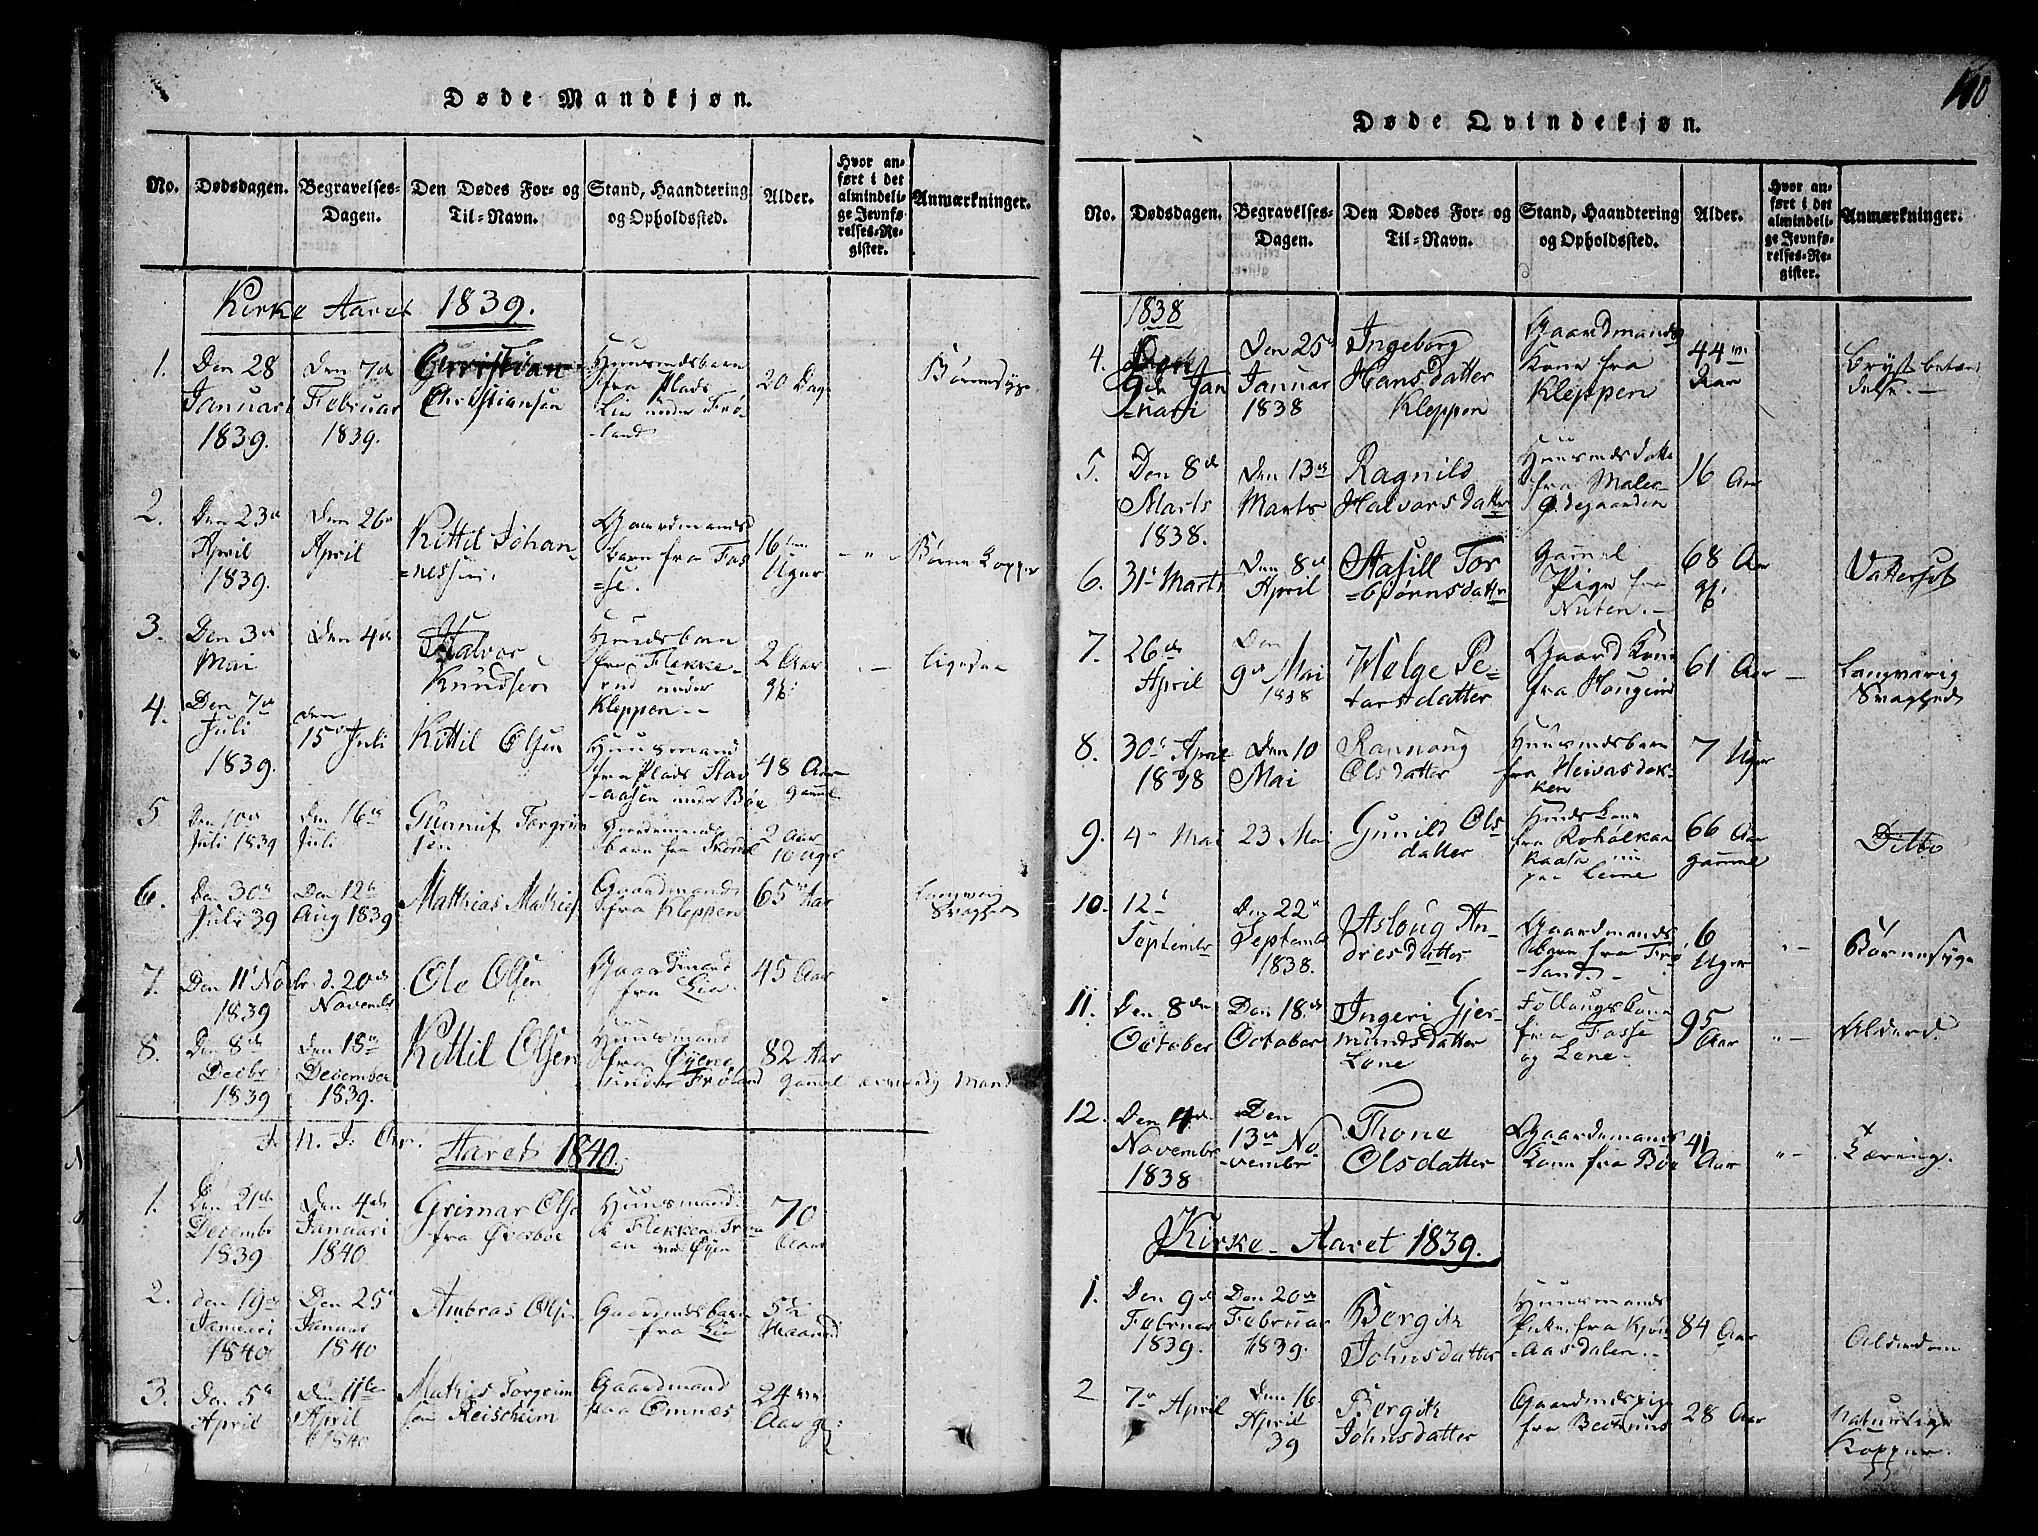 SAKO, Hjartdal kirkebøker, G/Gb/L0001: Klokkerbok nr. II 1, 1815-1842, s. 110